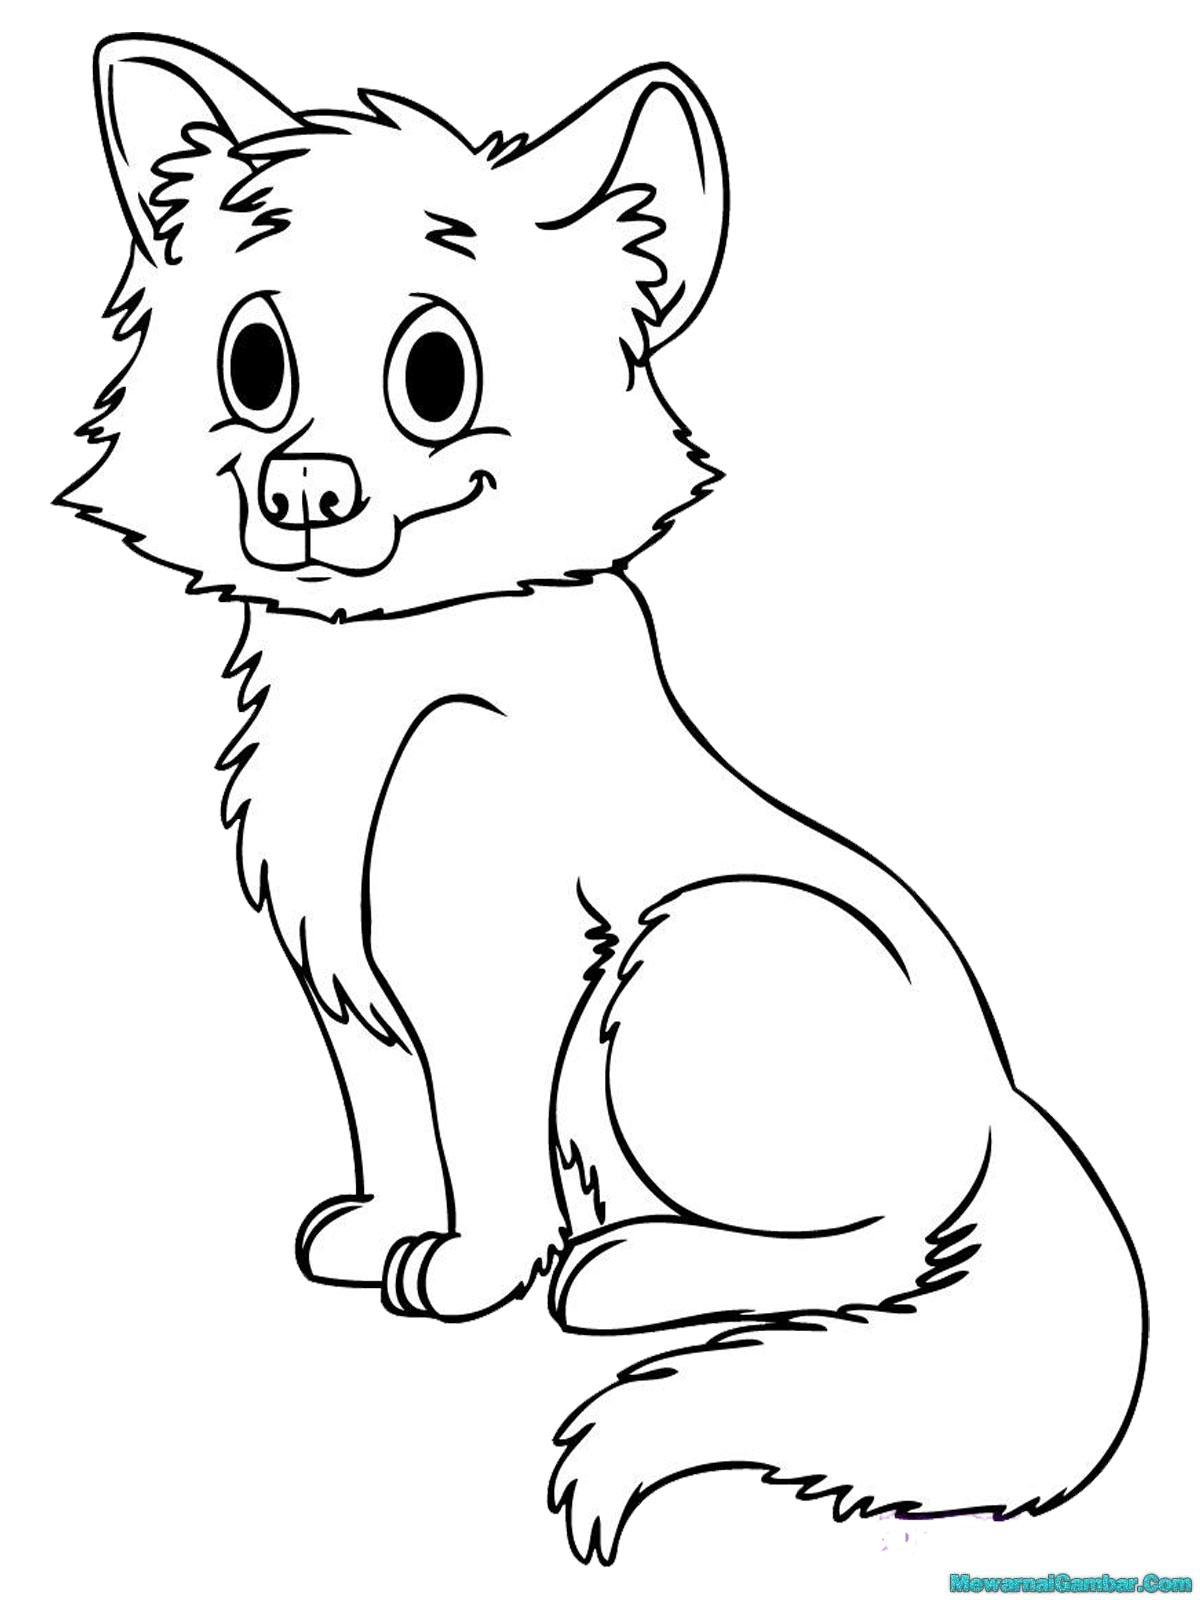 Mewarnai gambar 10 anak binatang mewarnai gambar for Printable baby animal coloring pages